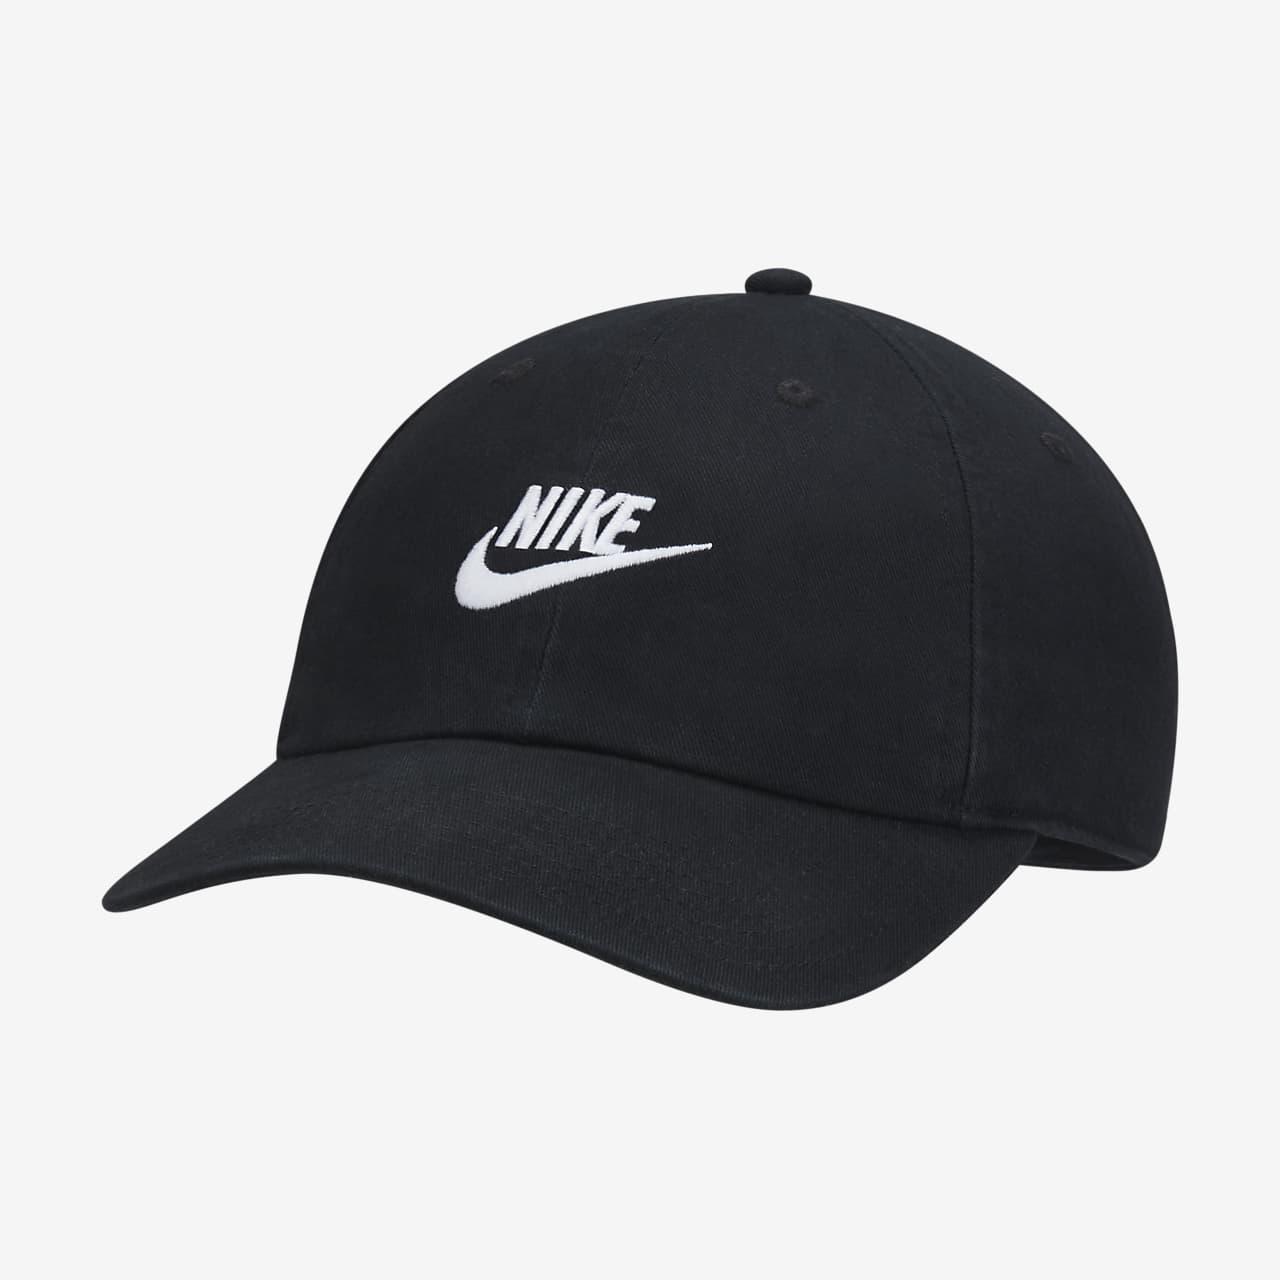 9d0035a8 Nike Sportswear Heritage86 Futura Washed Hat. Nike.com IN